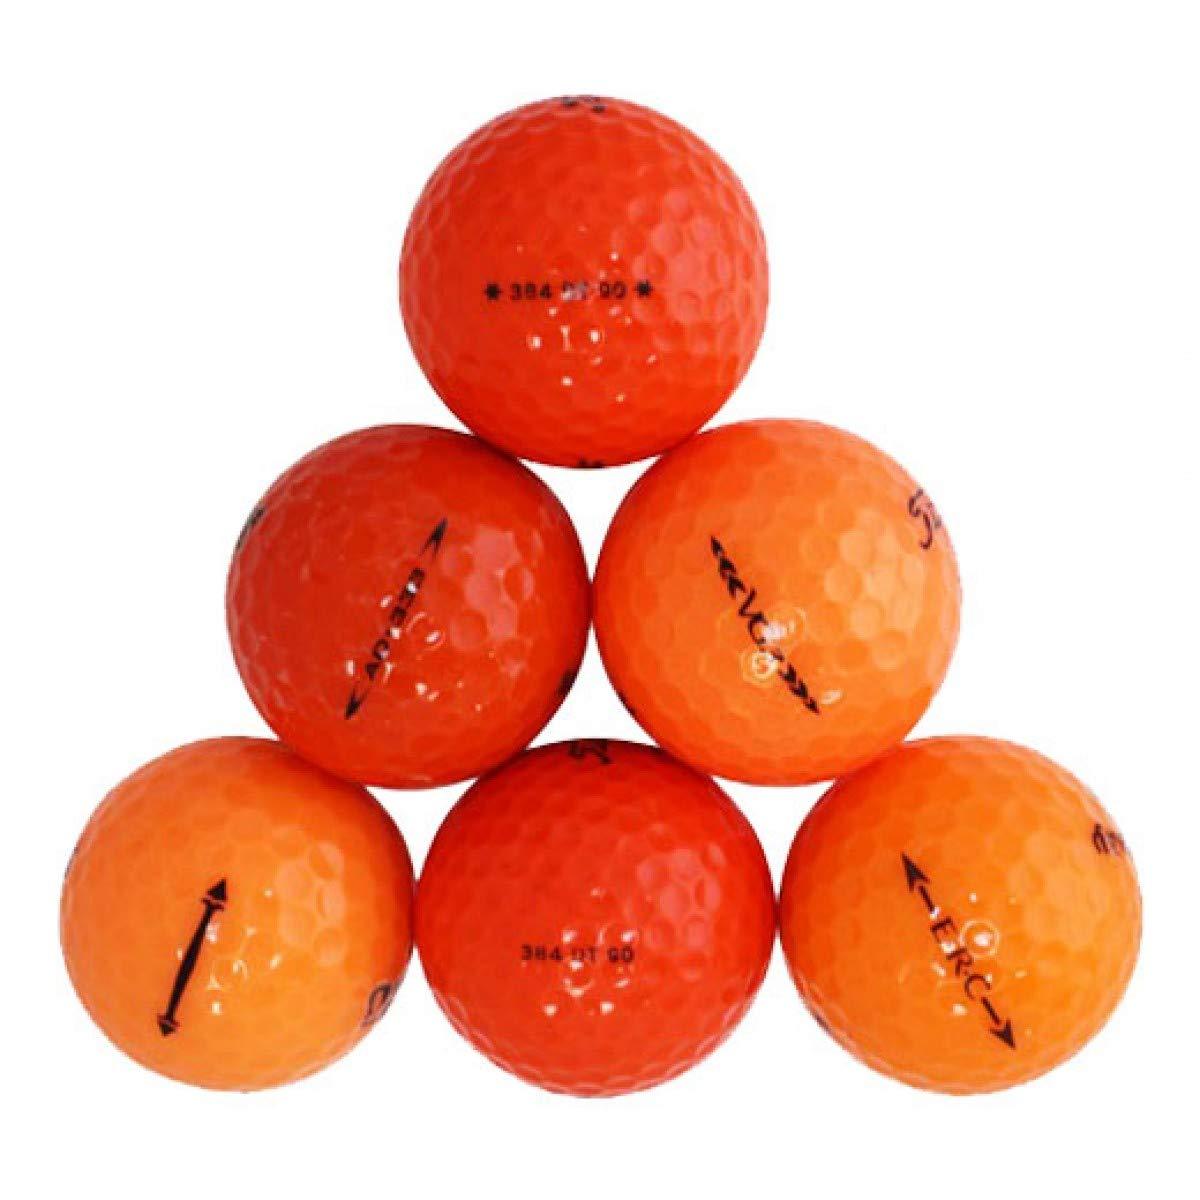 LostGolfBalls TaylorMade Lethalゴルフボール、ホワイト(Refurbished) (パックof 36 ) B01C4WOM32